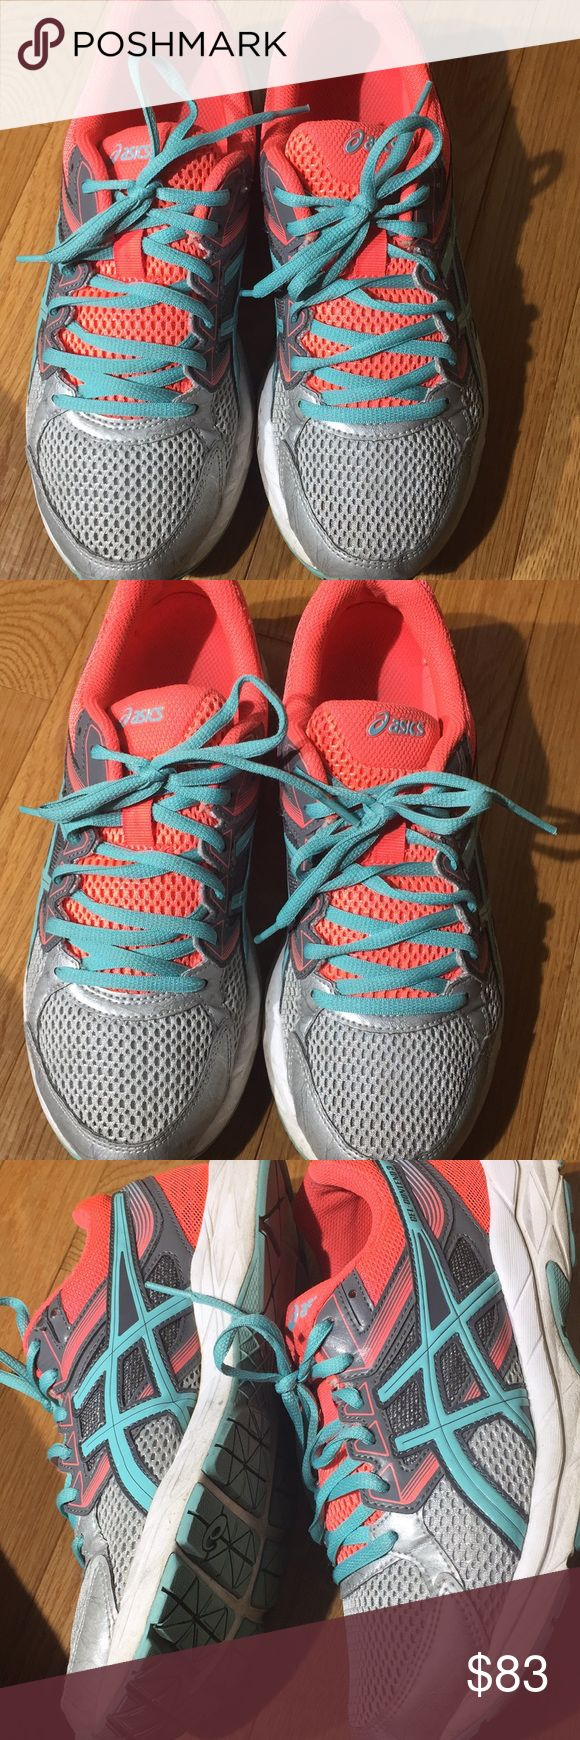 Spotted while shopping on Poshmark: ASICS Gel-Contend 3 Running Fitness Gymshoes! #poshmark #fashion #shopping #style #ASICS #Shoes